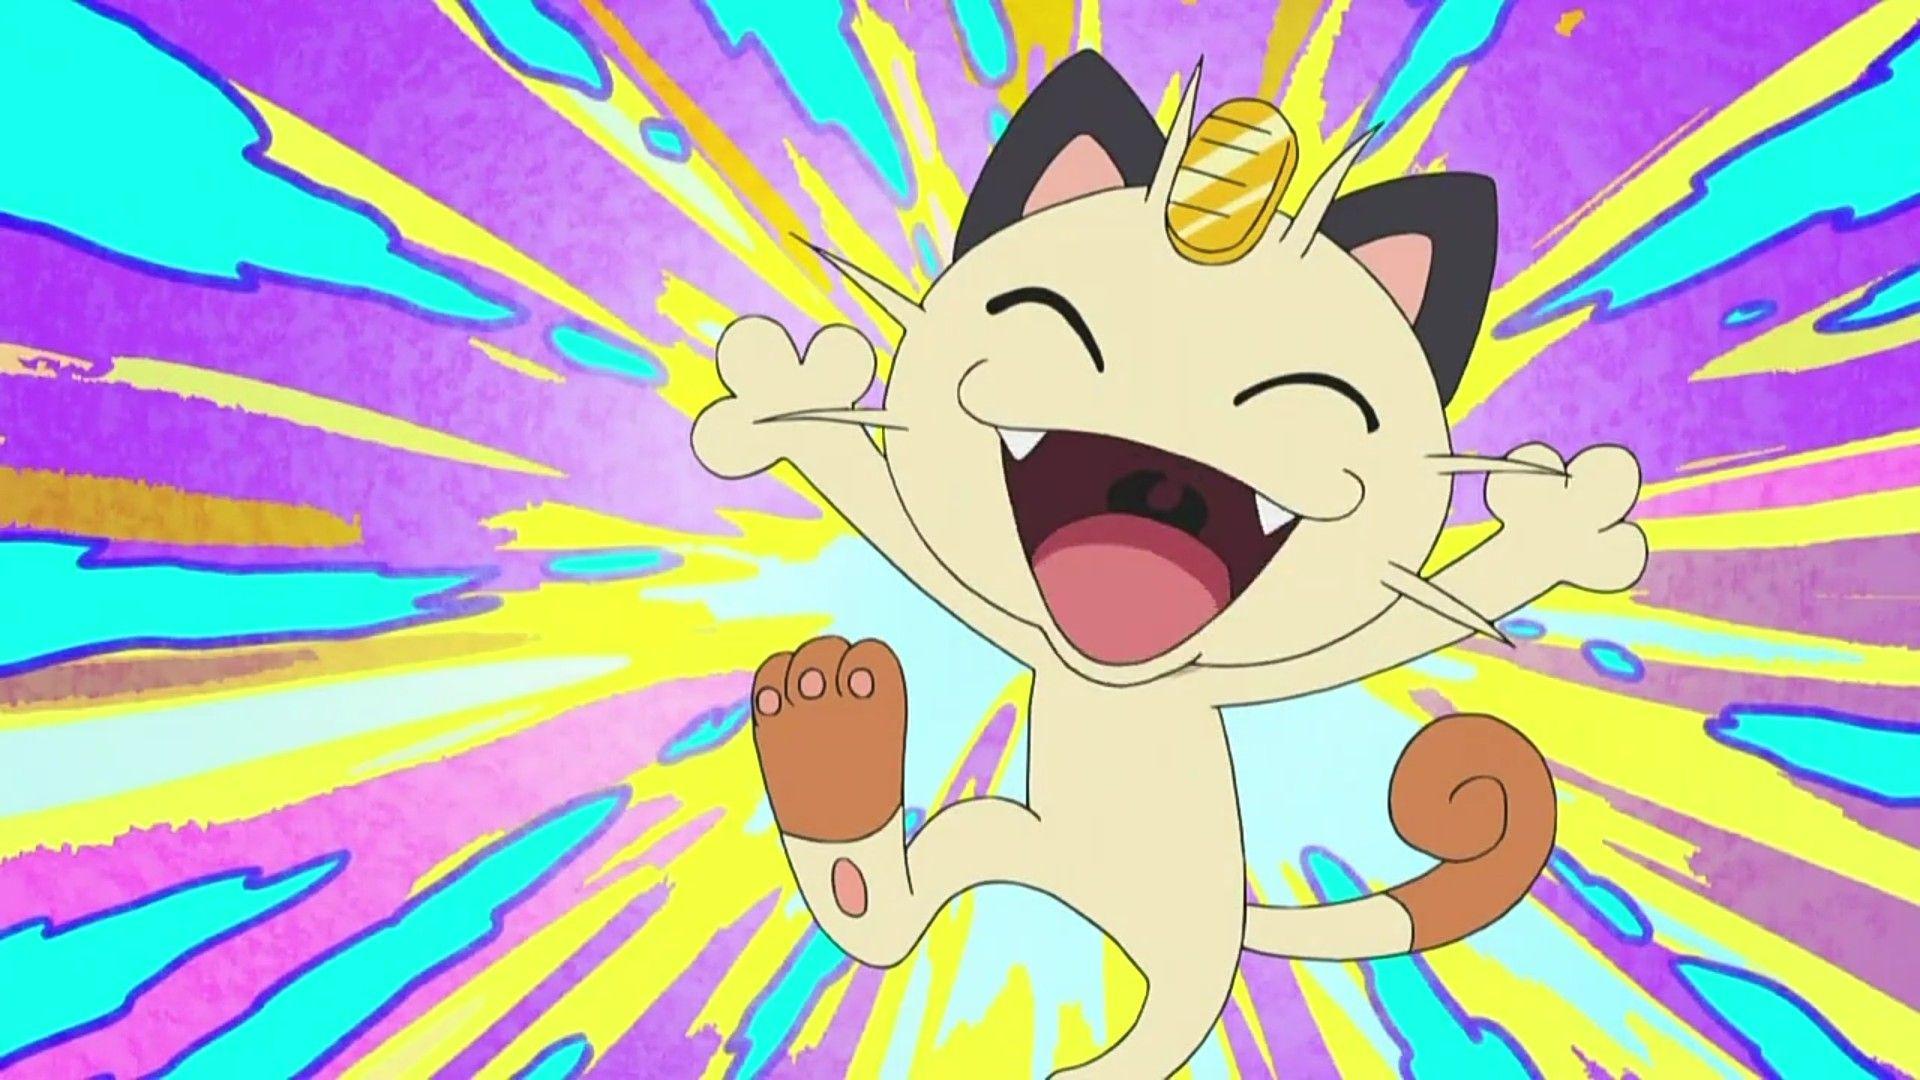 Meowth Screenshot Pokemon Meowth Pokemon Pictures Pokemon Team Rocket